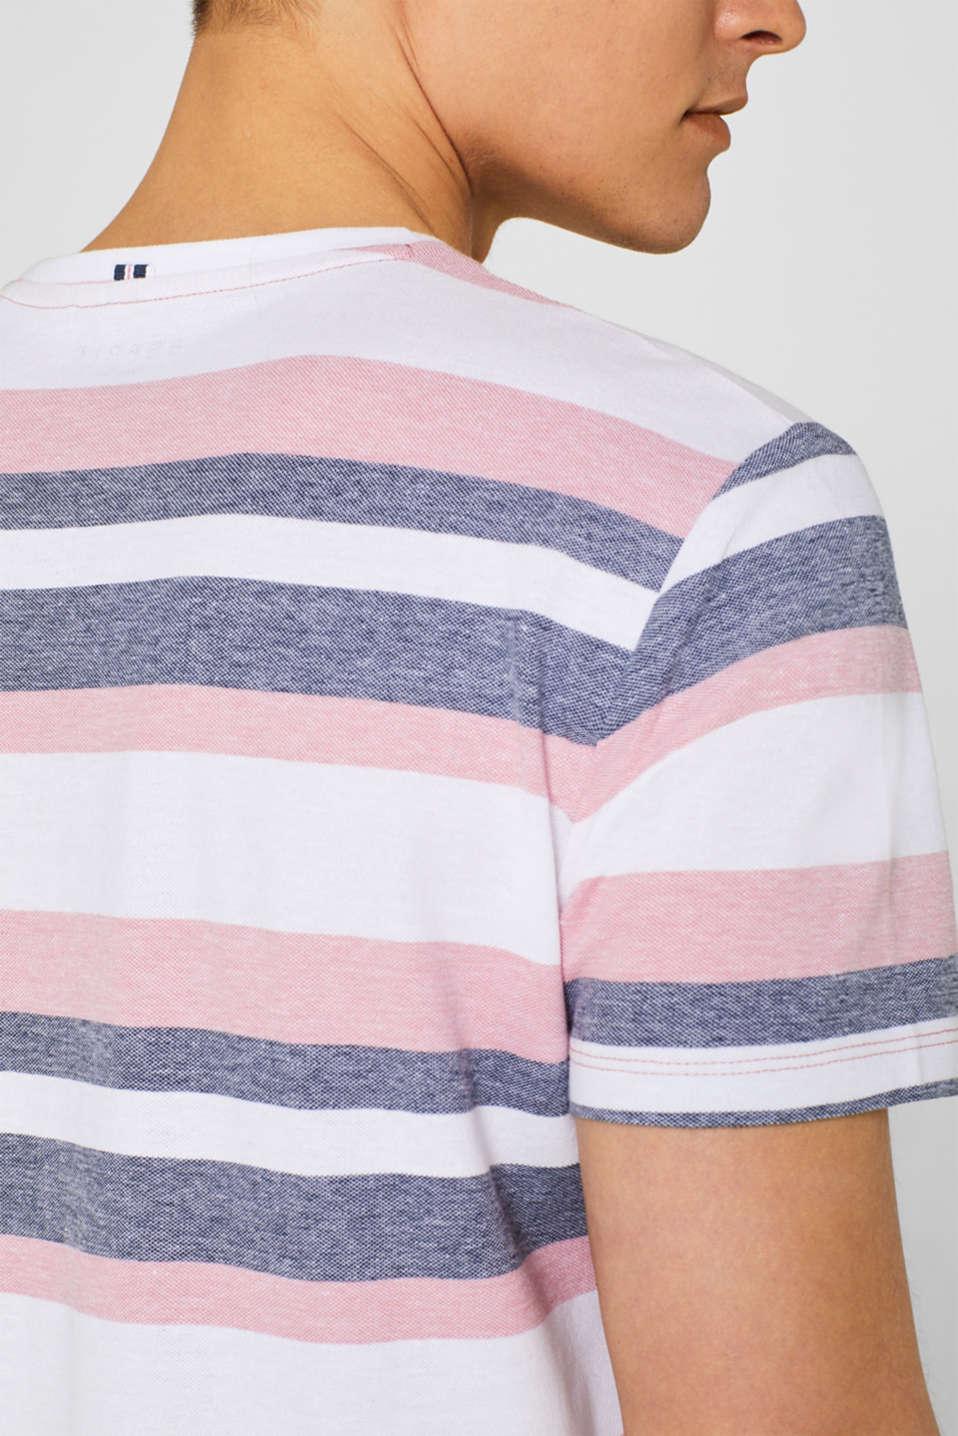 Piqué T-shirt with stripes, BLUSH, detail image number 1